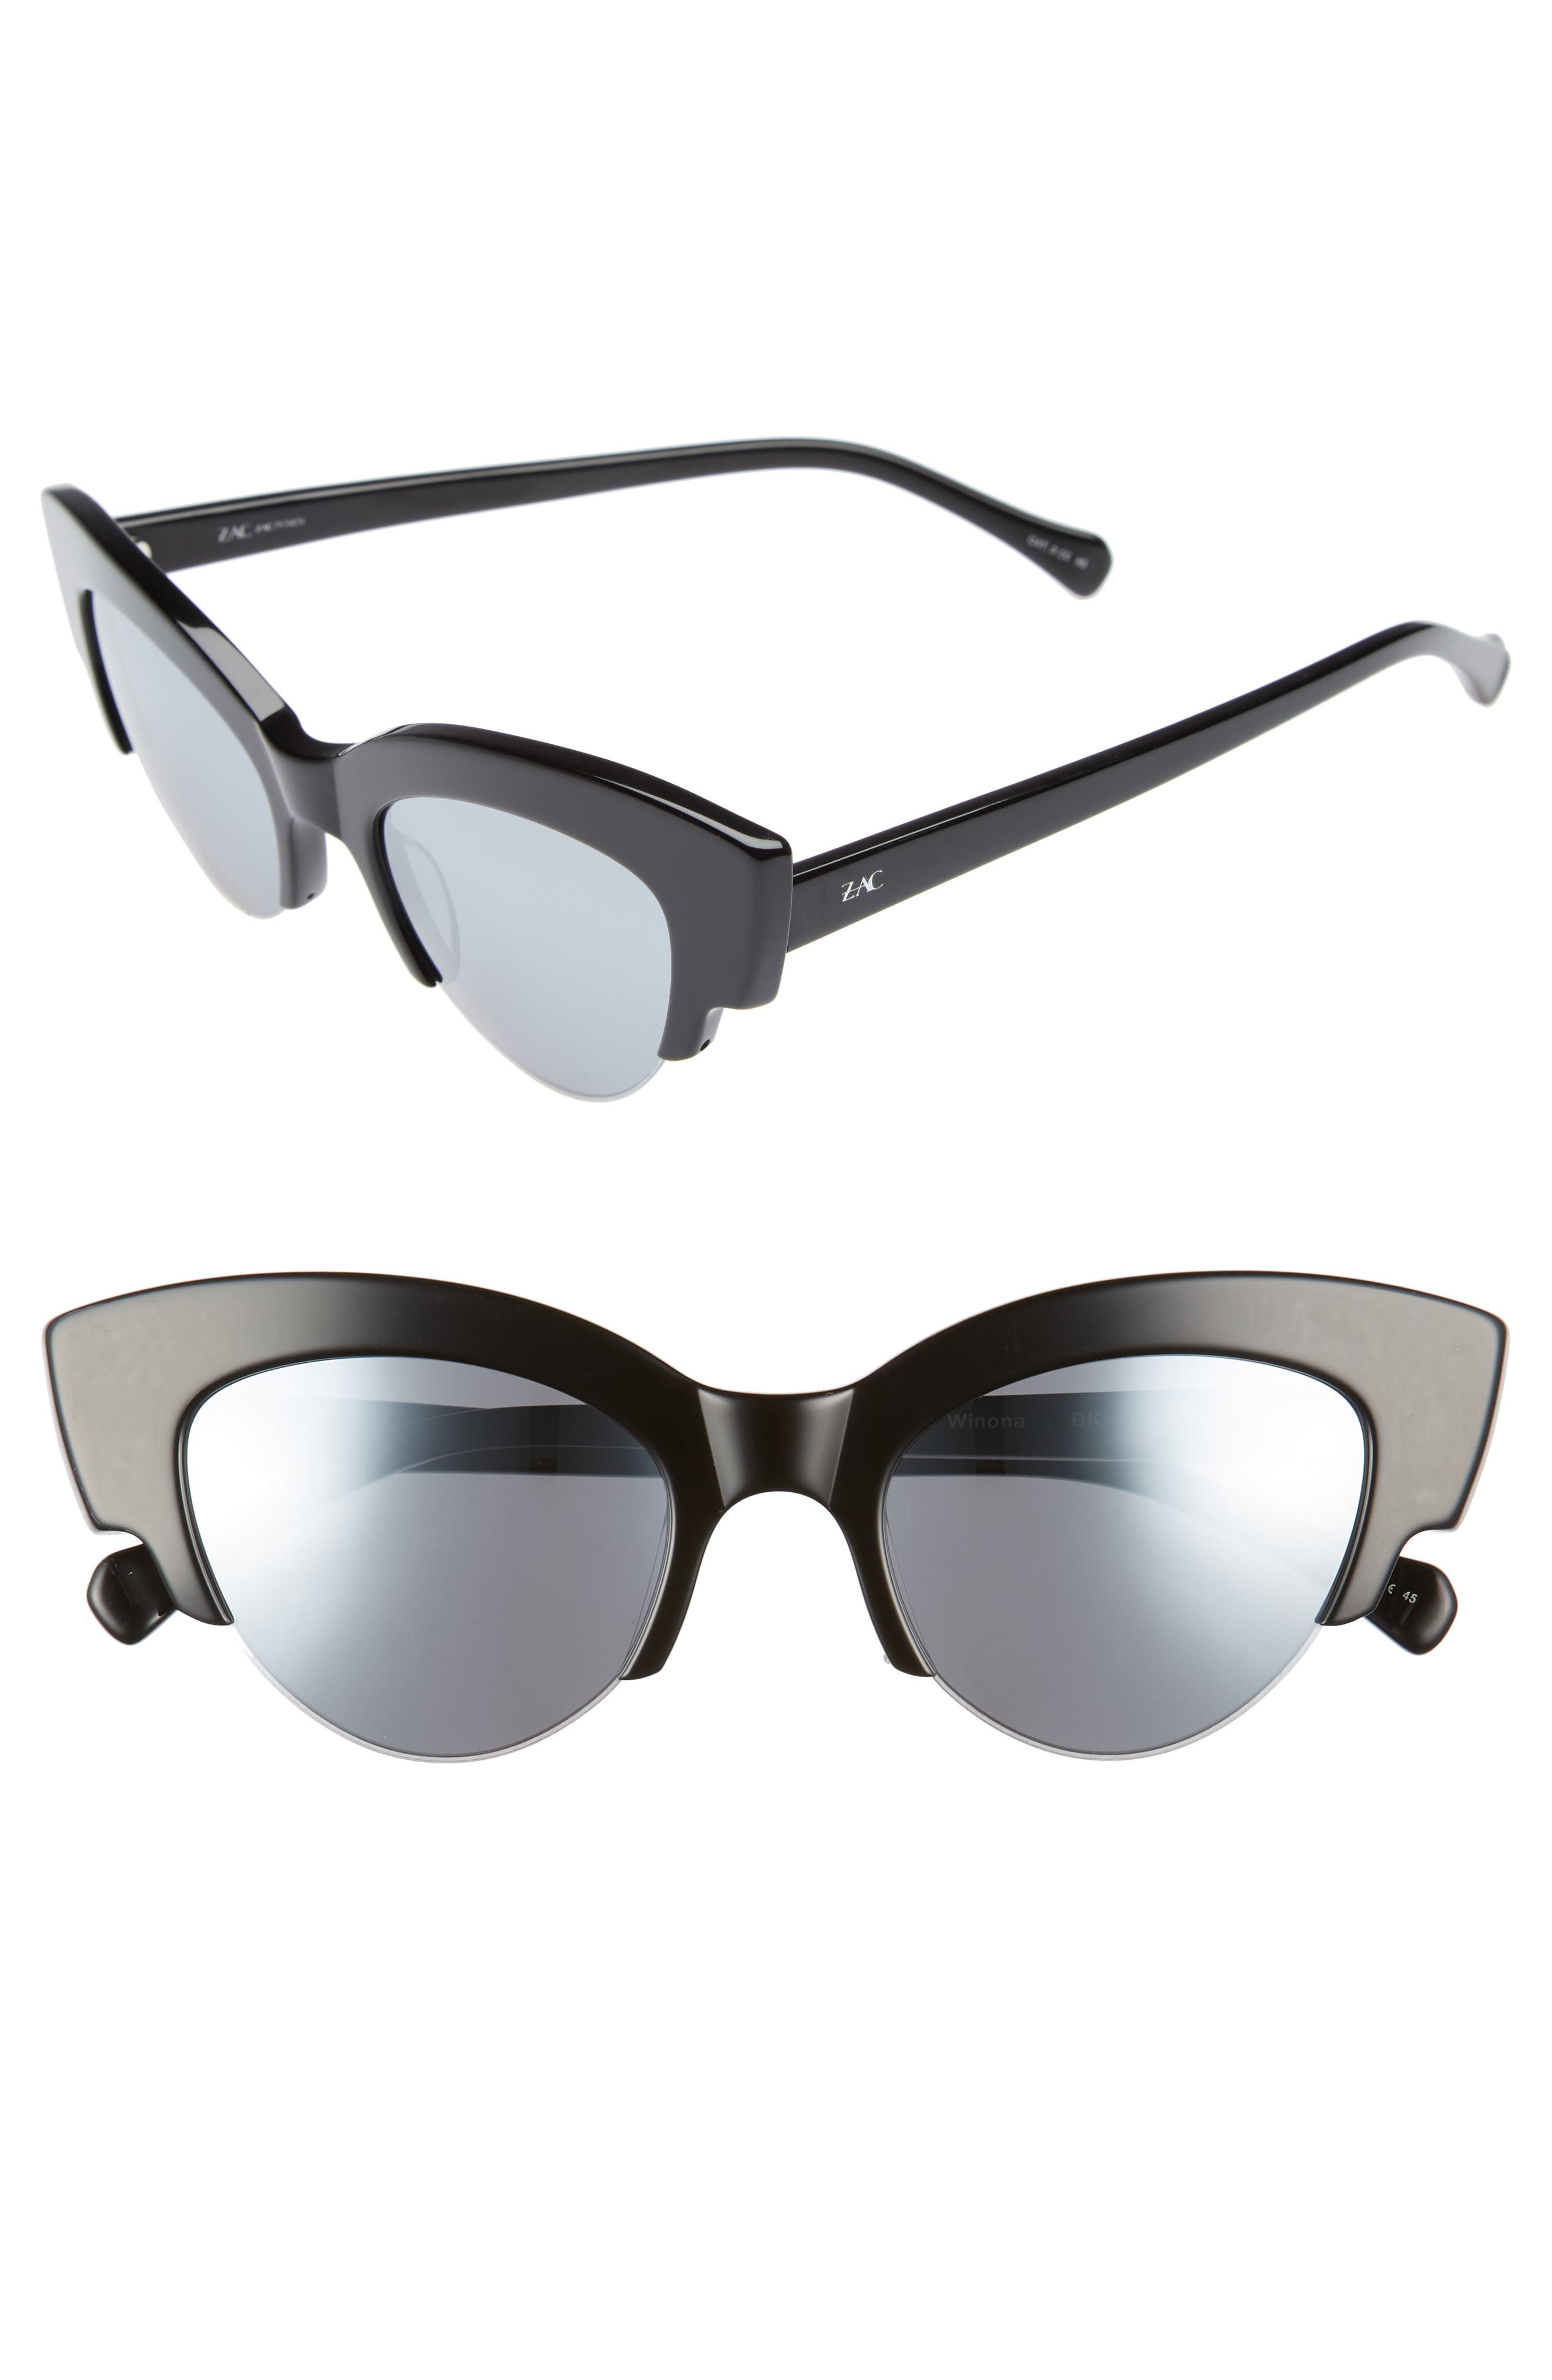 ZAC ZAC POSEN,                             Winona Cat Eye Sunglasses,                             Main thumbnail 1, color,                             BLACK/ SILVER